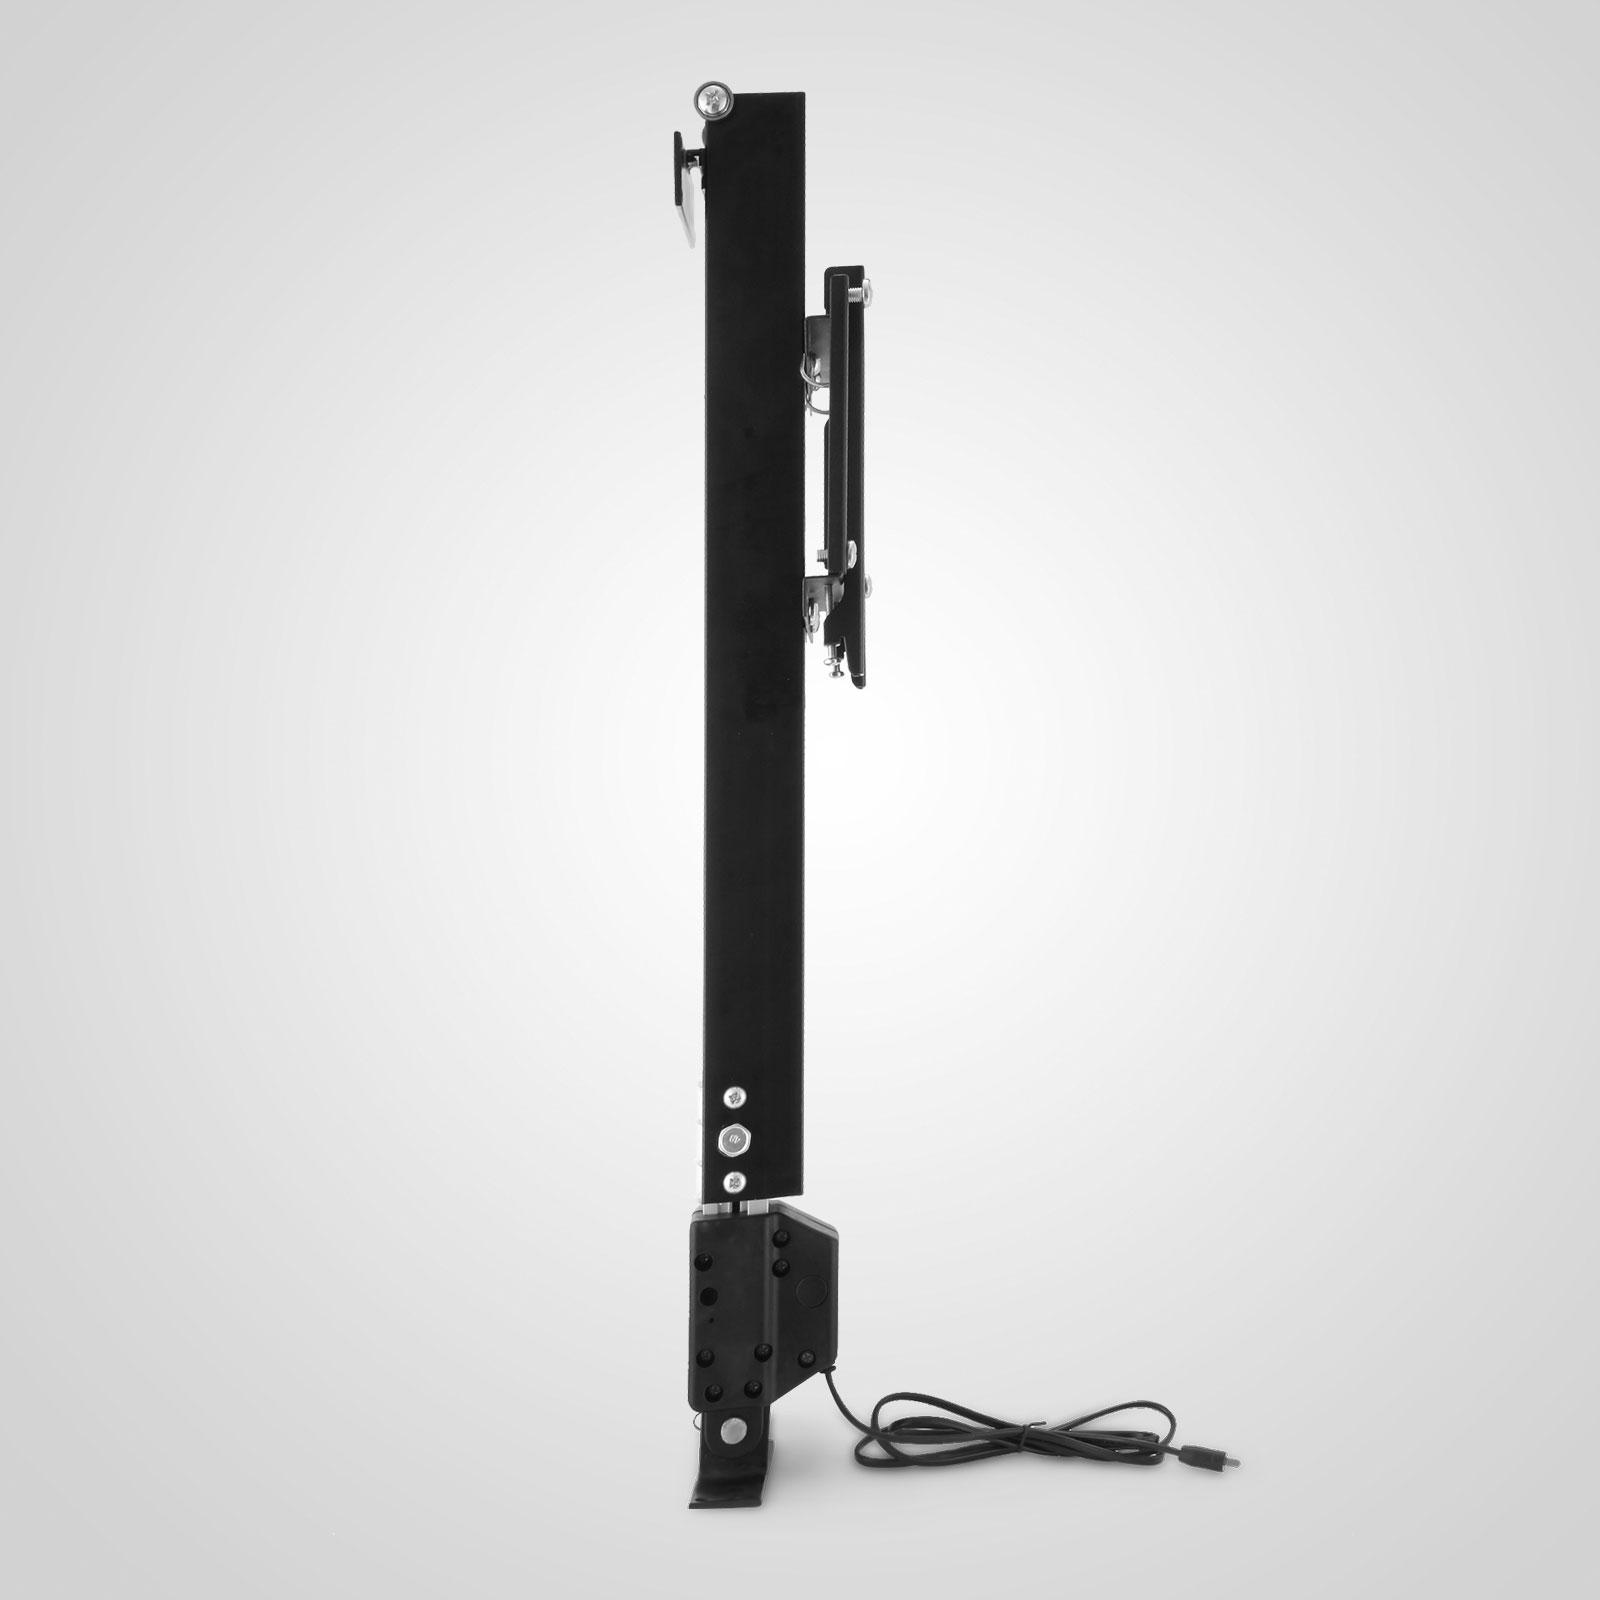 28 tv lift standfu bracket h henverstellbar elektrisch. Black Bedroom Furniture Sets. Home Design Ideas